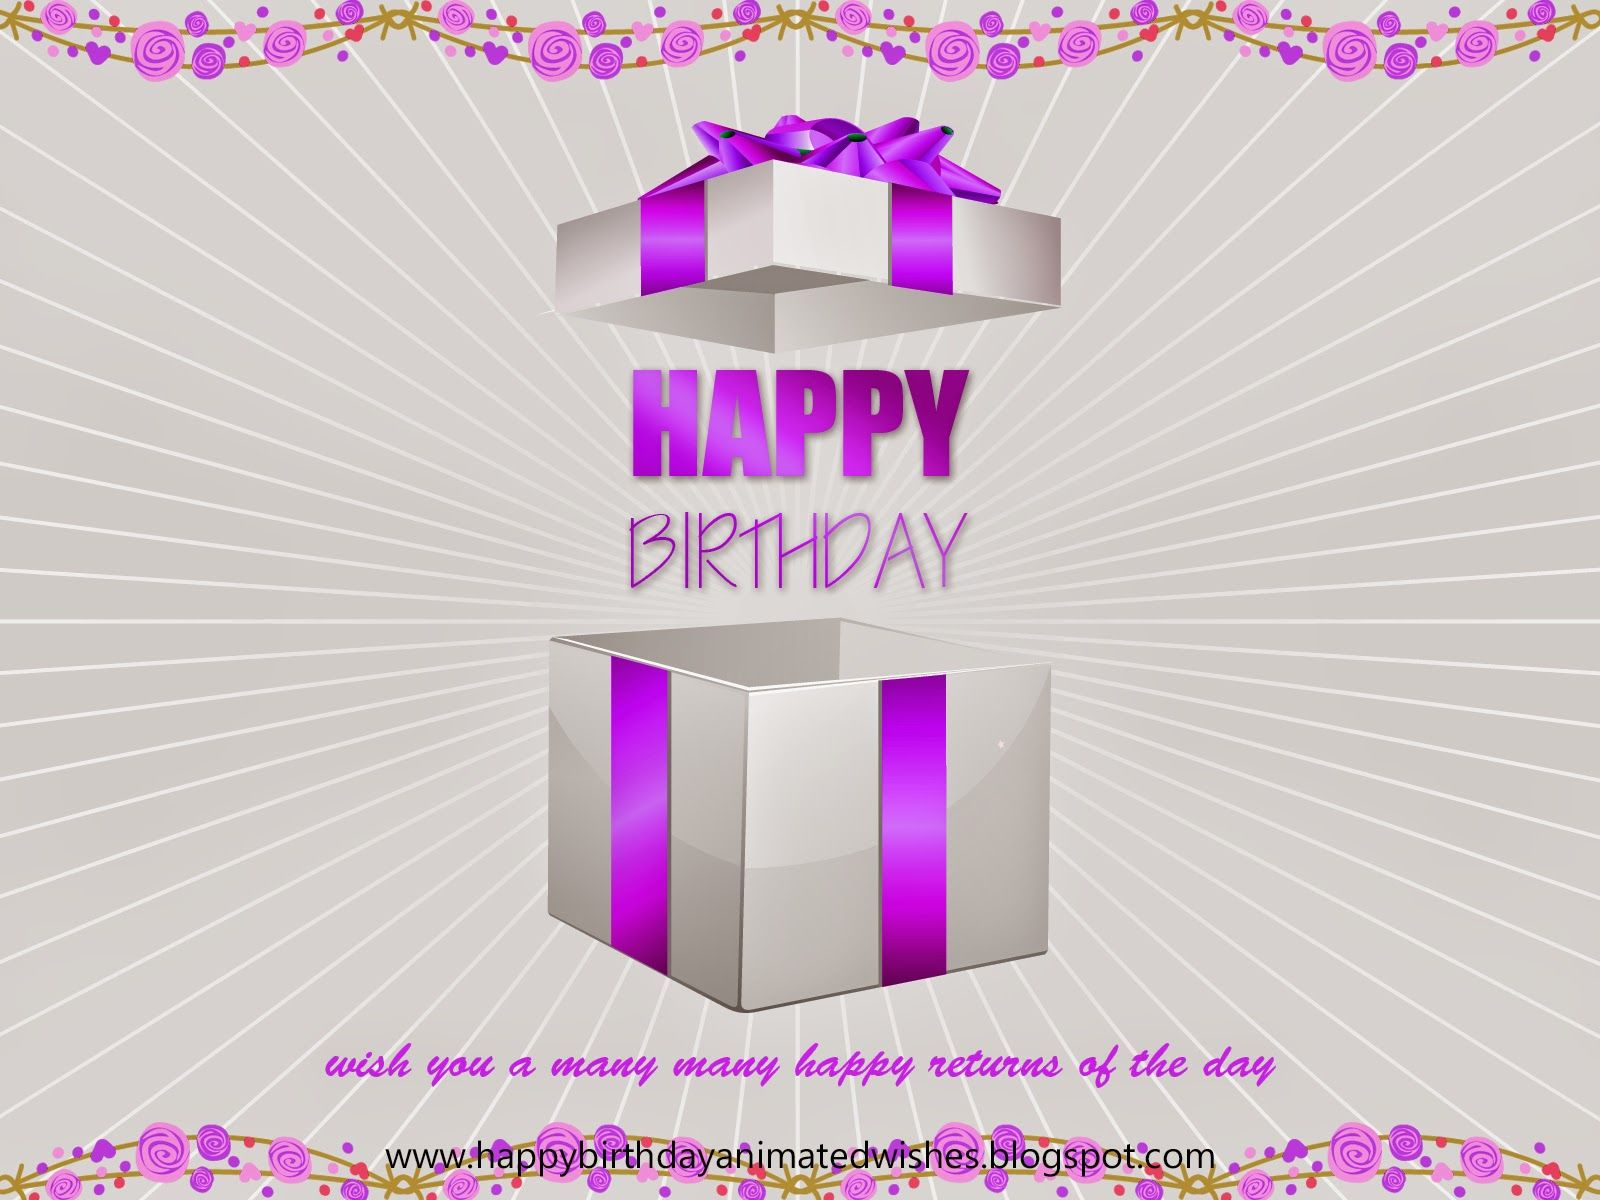 HAPPY BIRTHDAY WISHES Happy Birthday Wishes 21